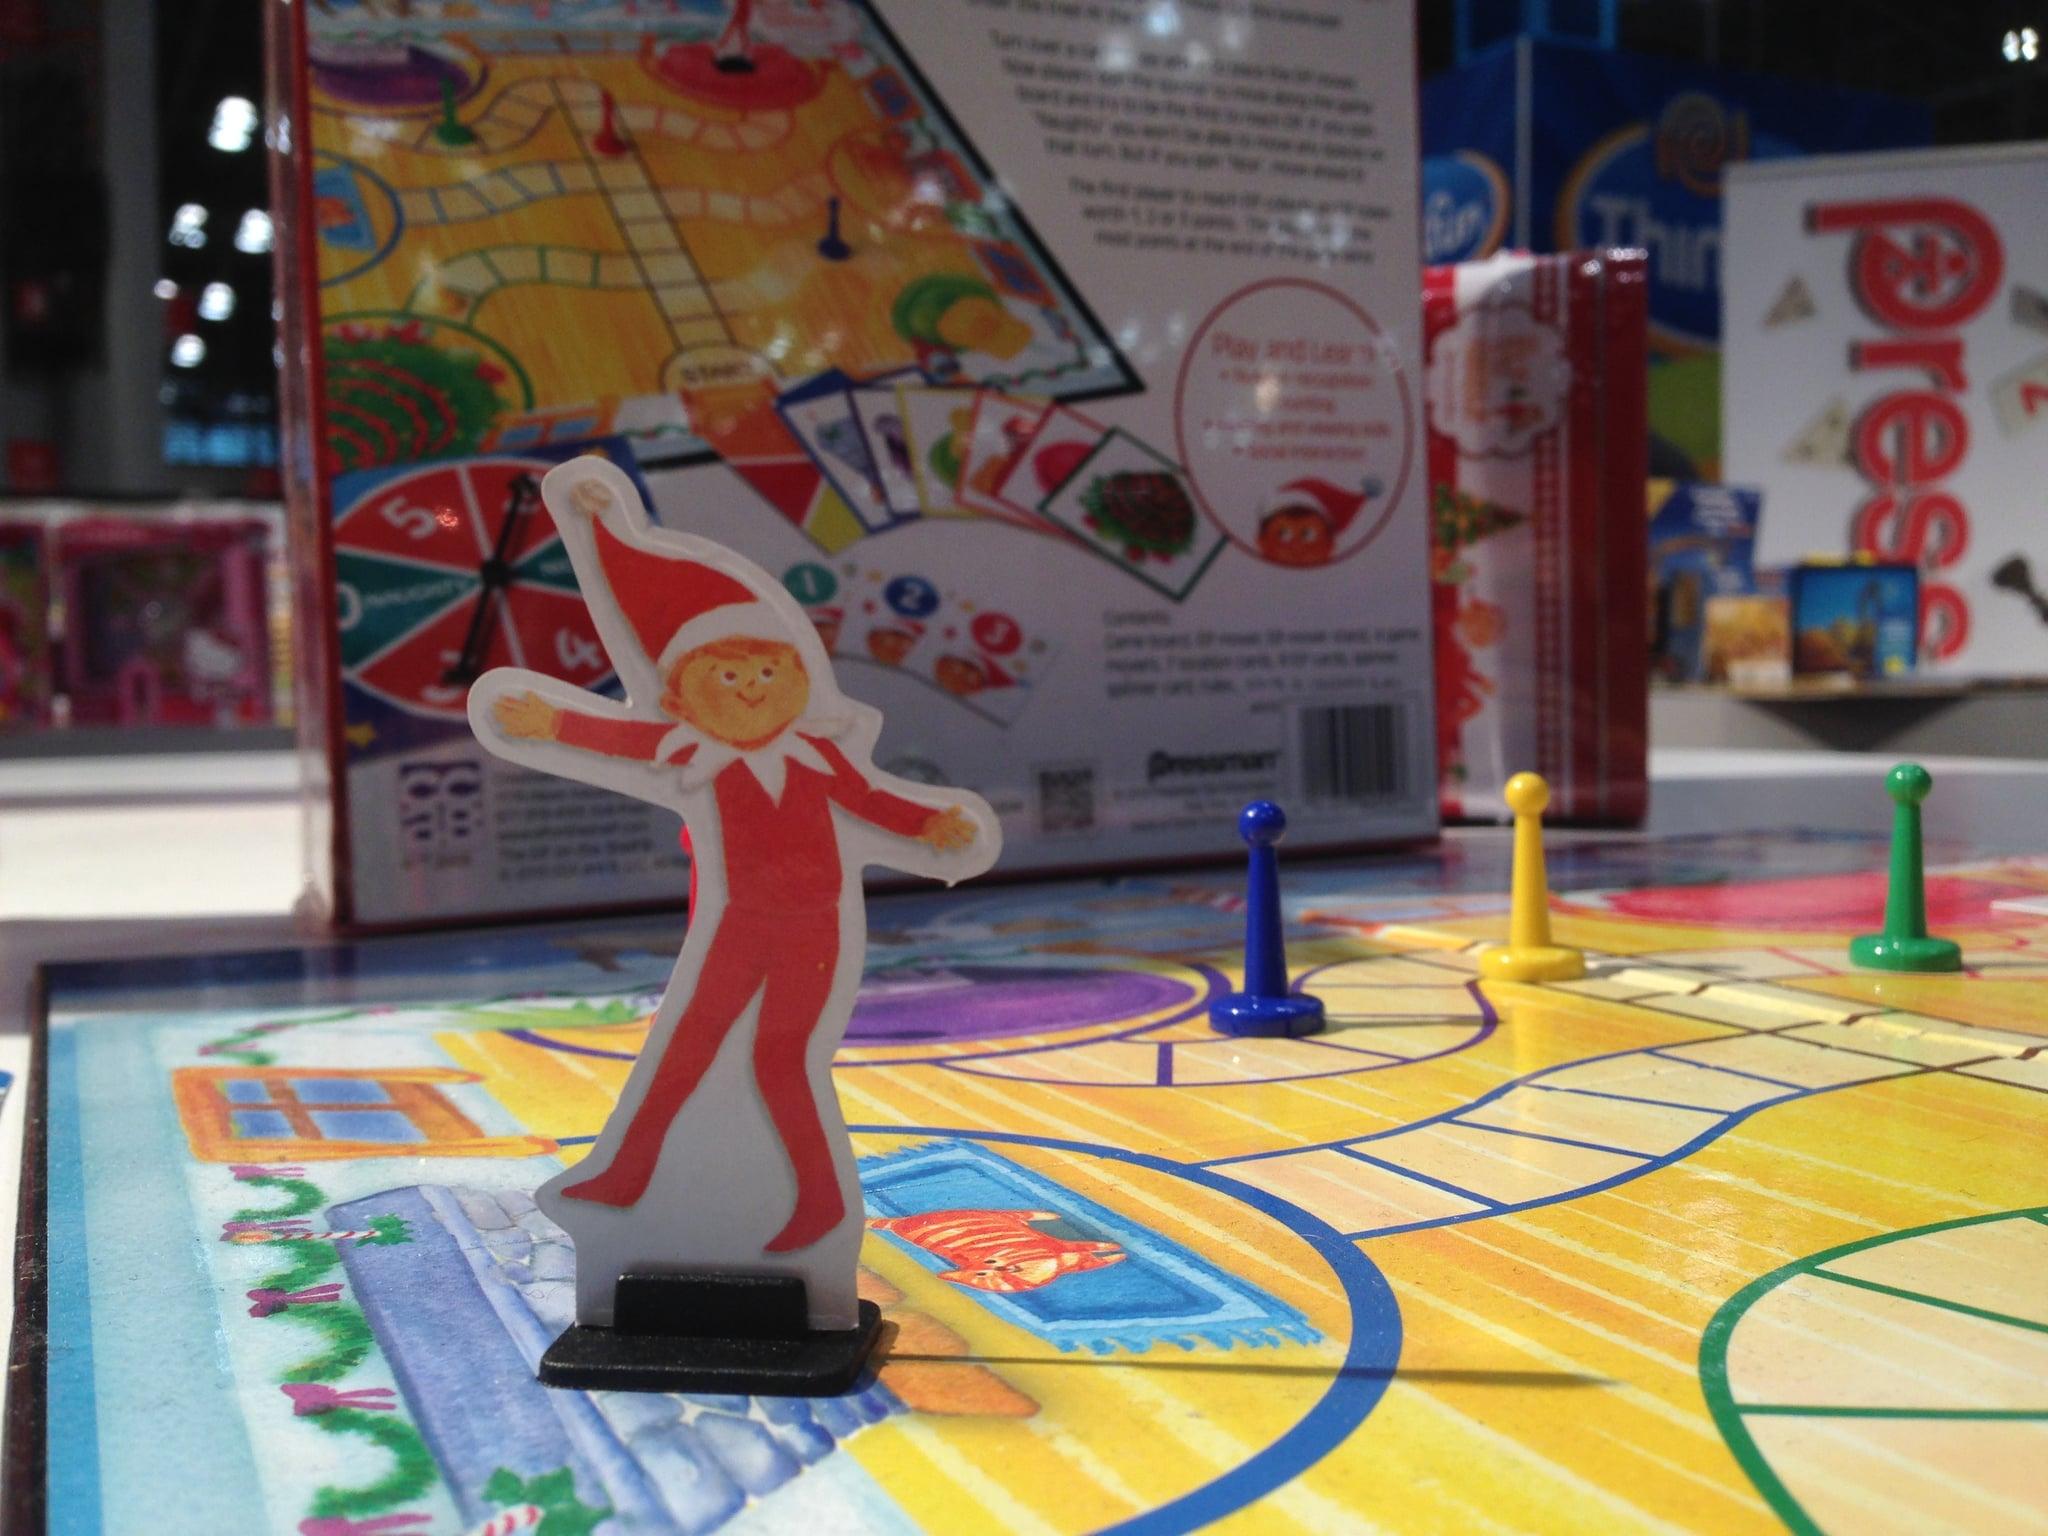 Elf on the Shelf: The Board Game